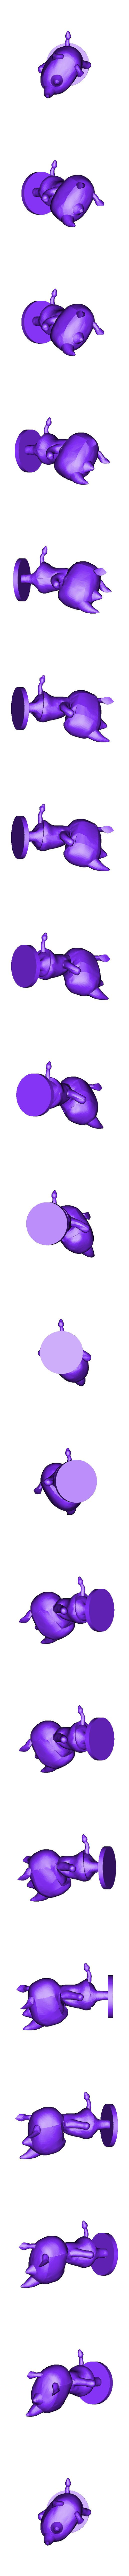 merengue full.stl Download free STL file Merengue from Animal Crossing • 3D print template, skelei